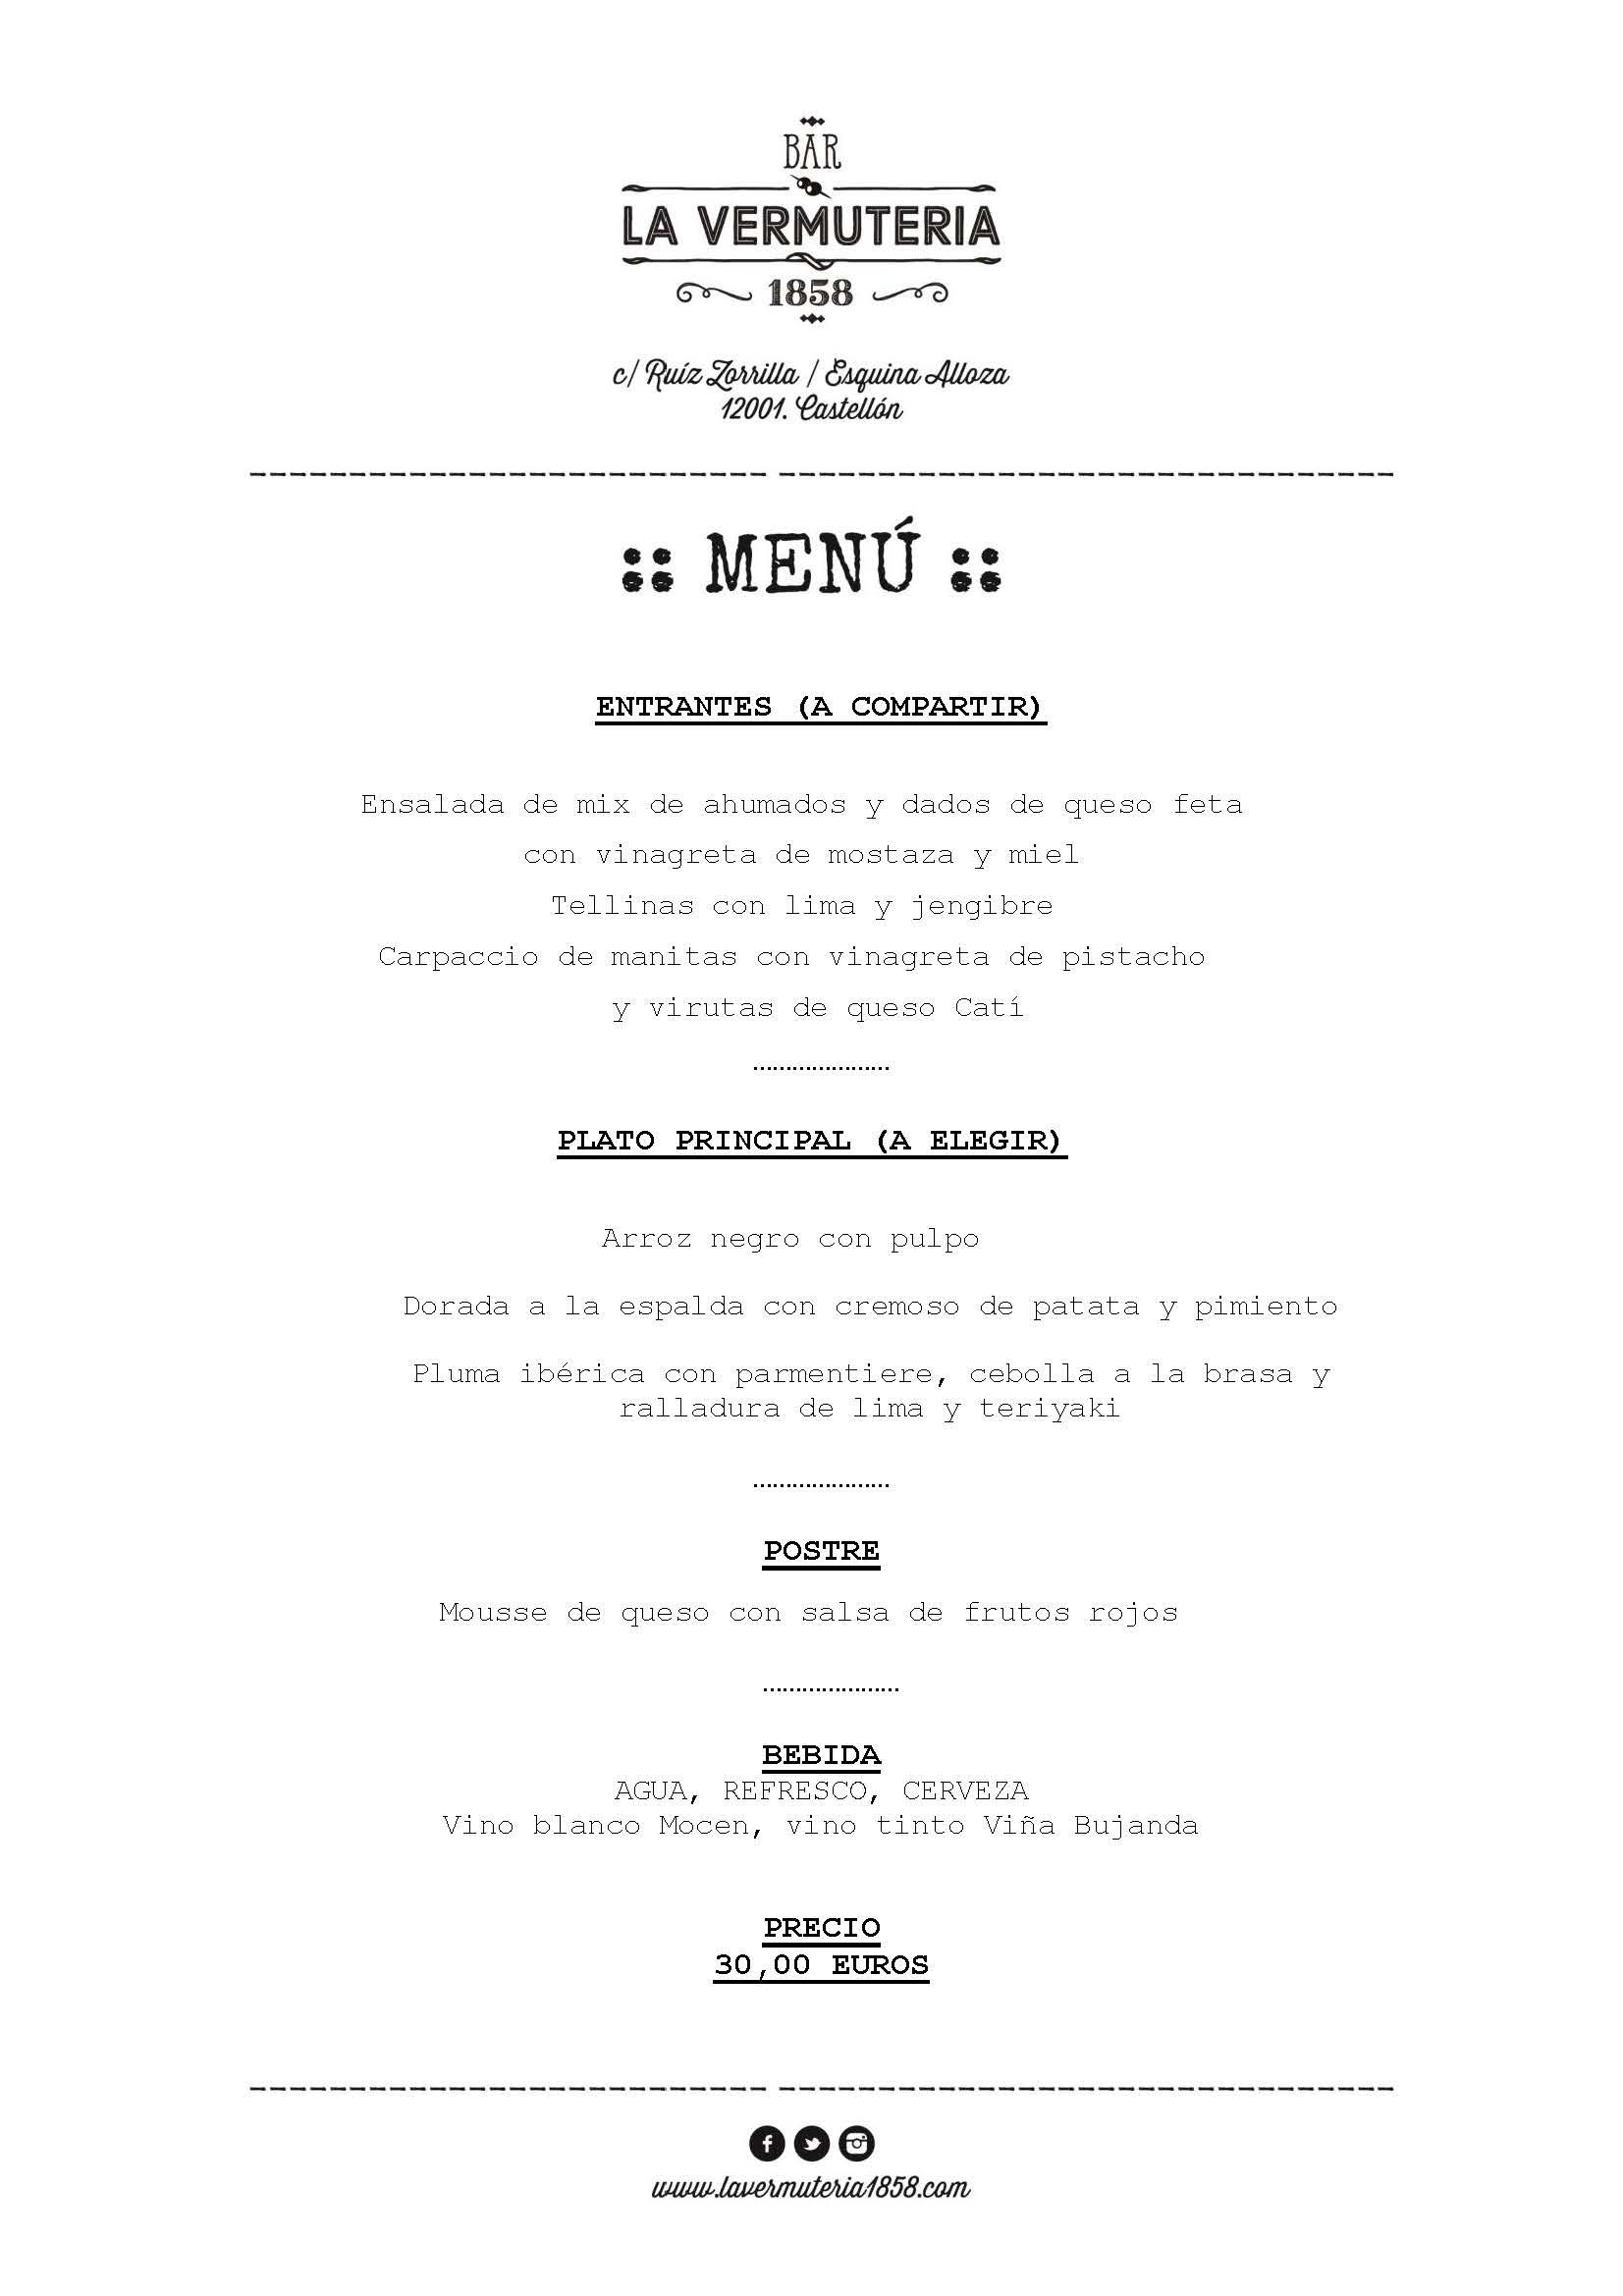 Menú 2 La Vermuteria 1858